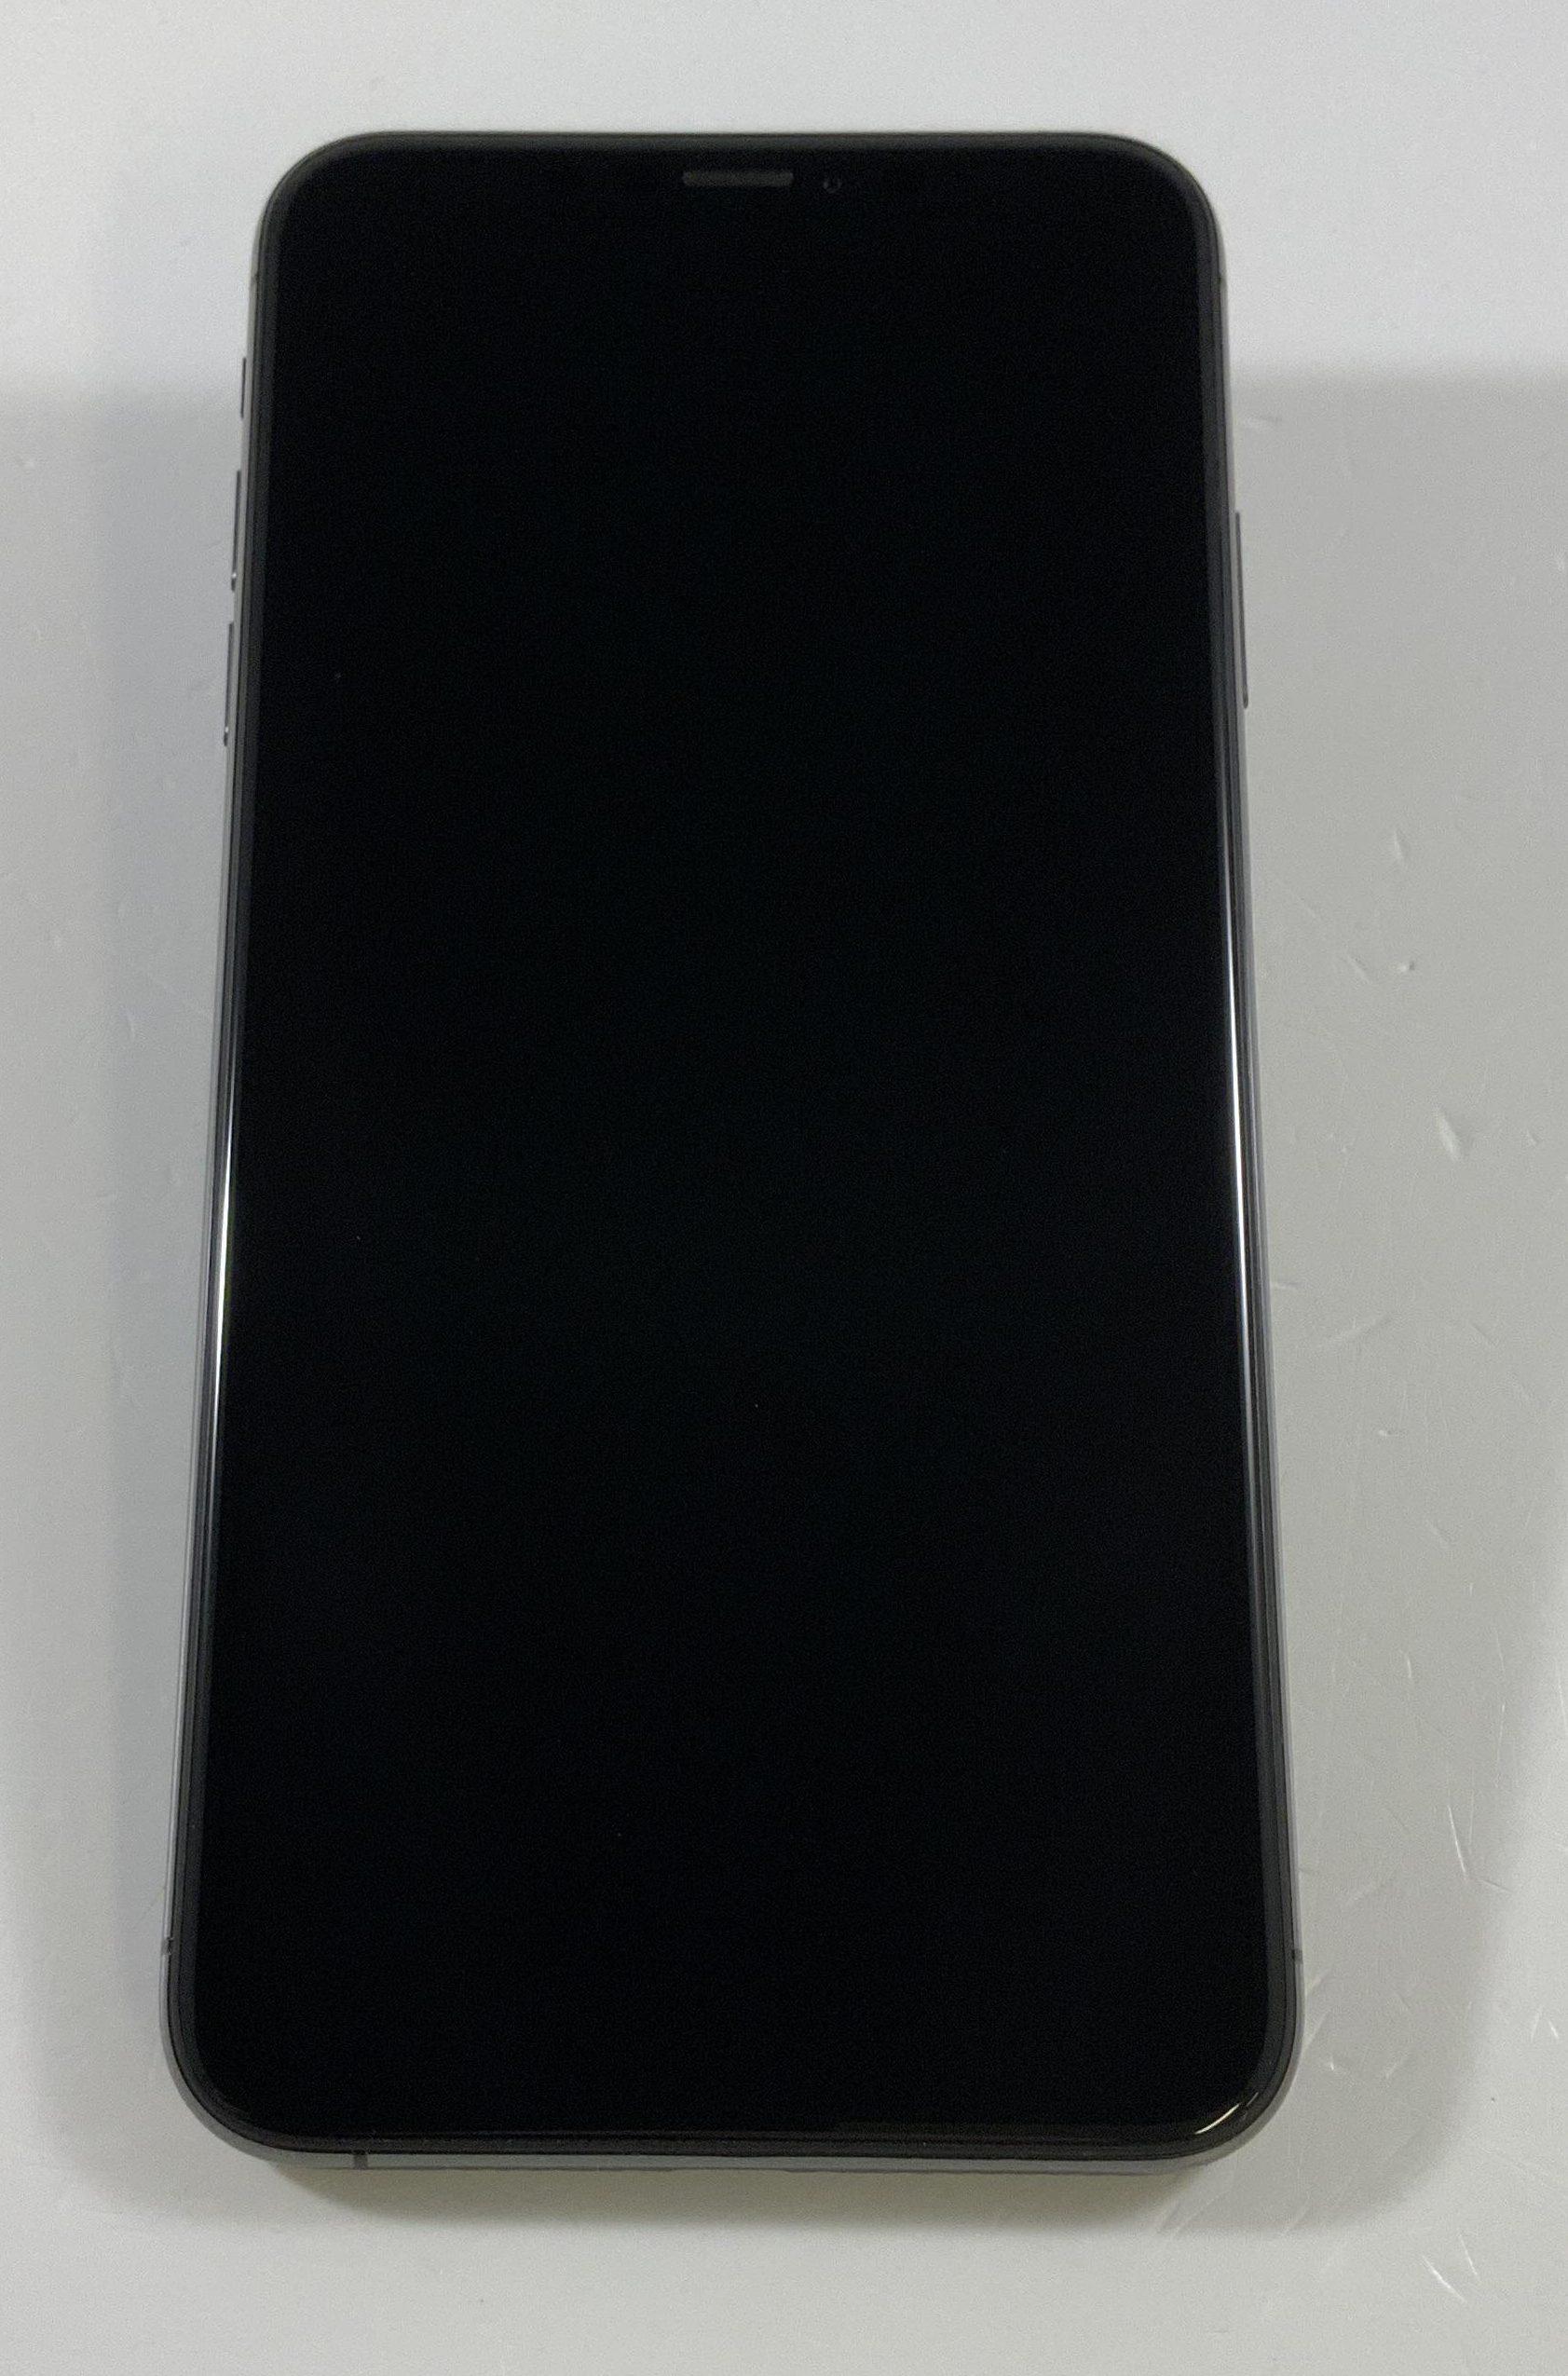 iPhone XS Max 256GB, 256GB, Space Gray, imagen 1